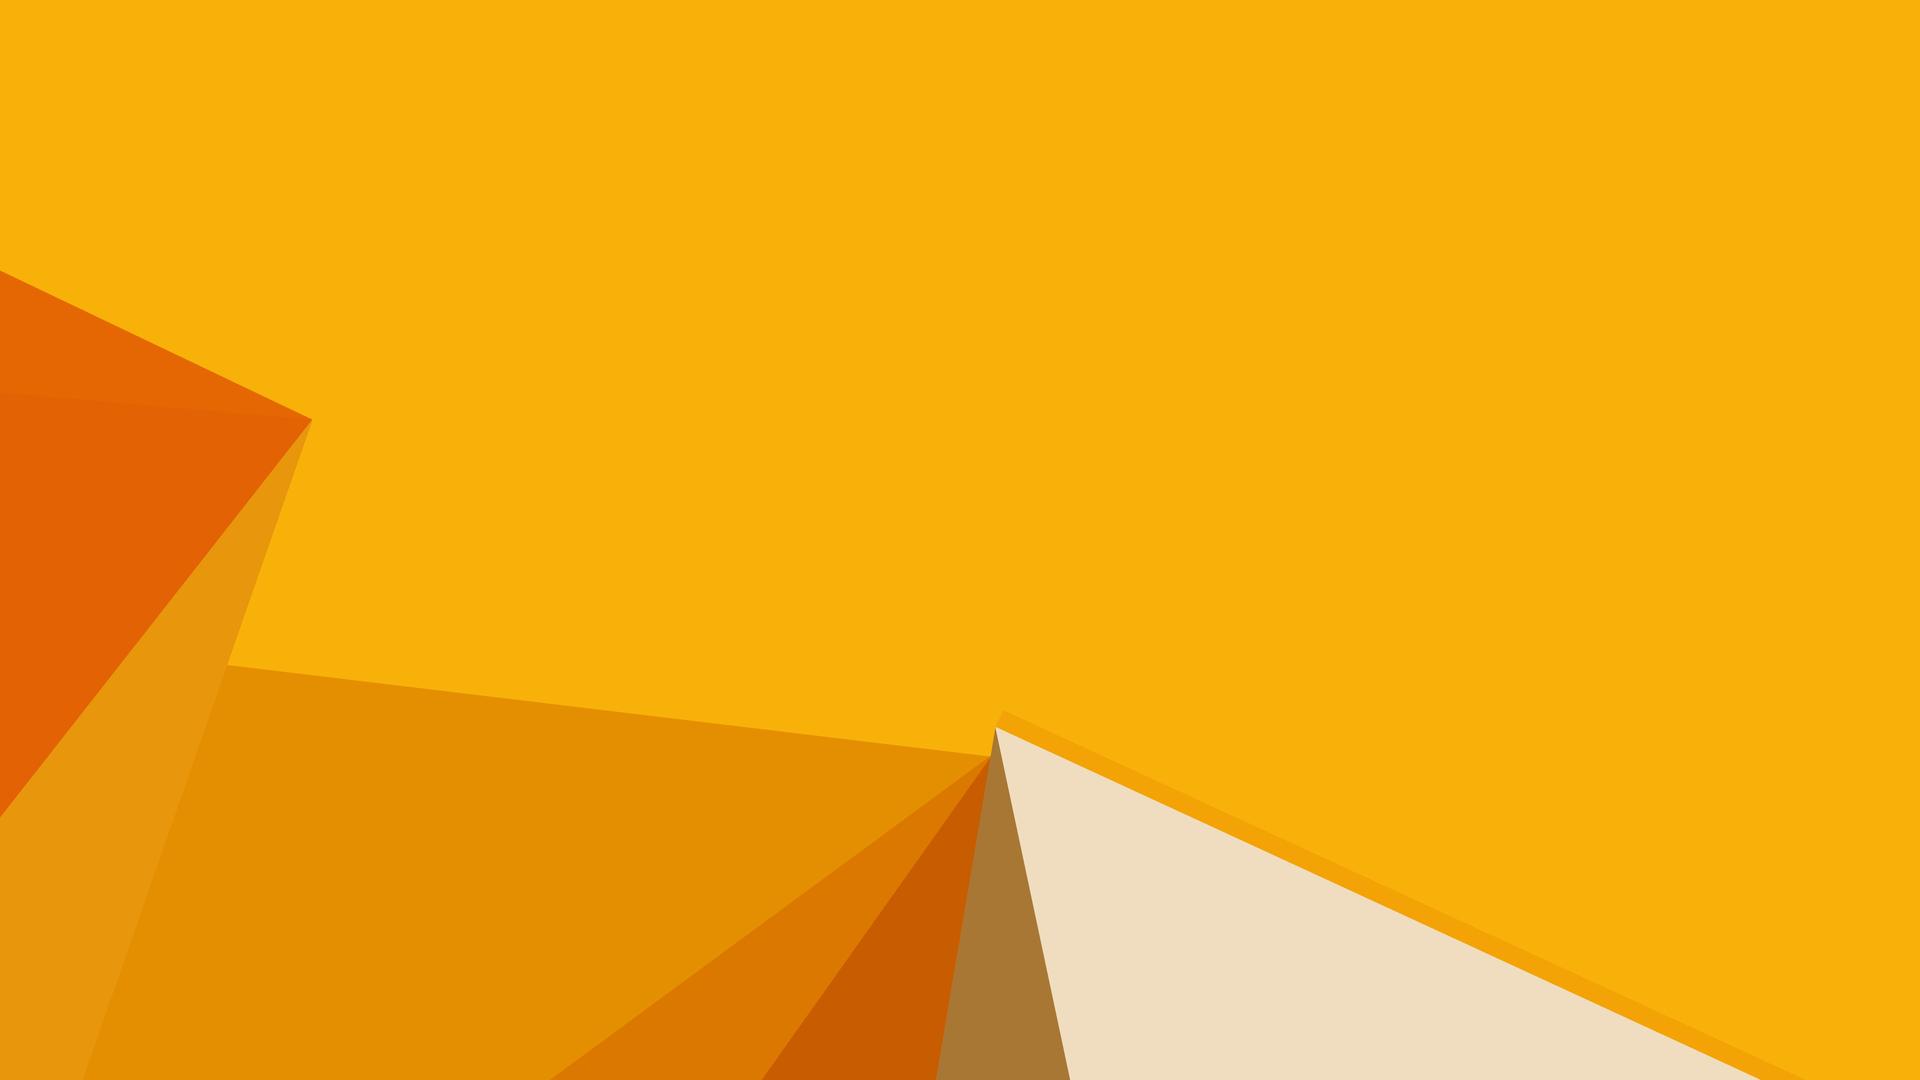 1920x1080 Abstract Orange Shapes Laptop Full Hd 1080p Hd 4k